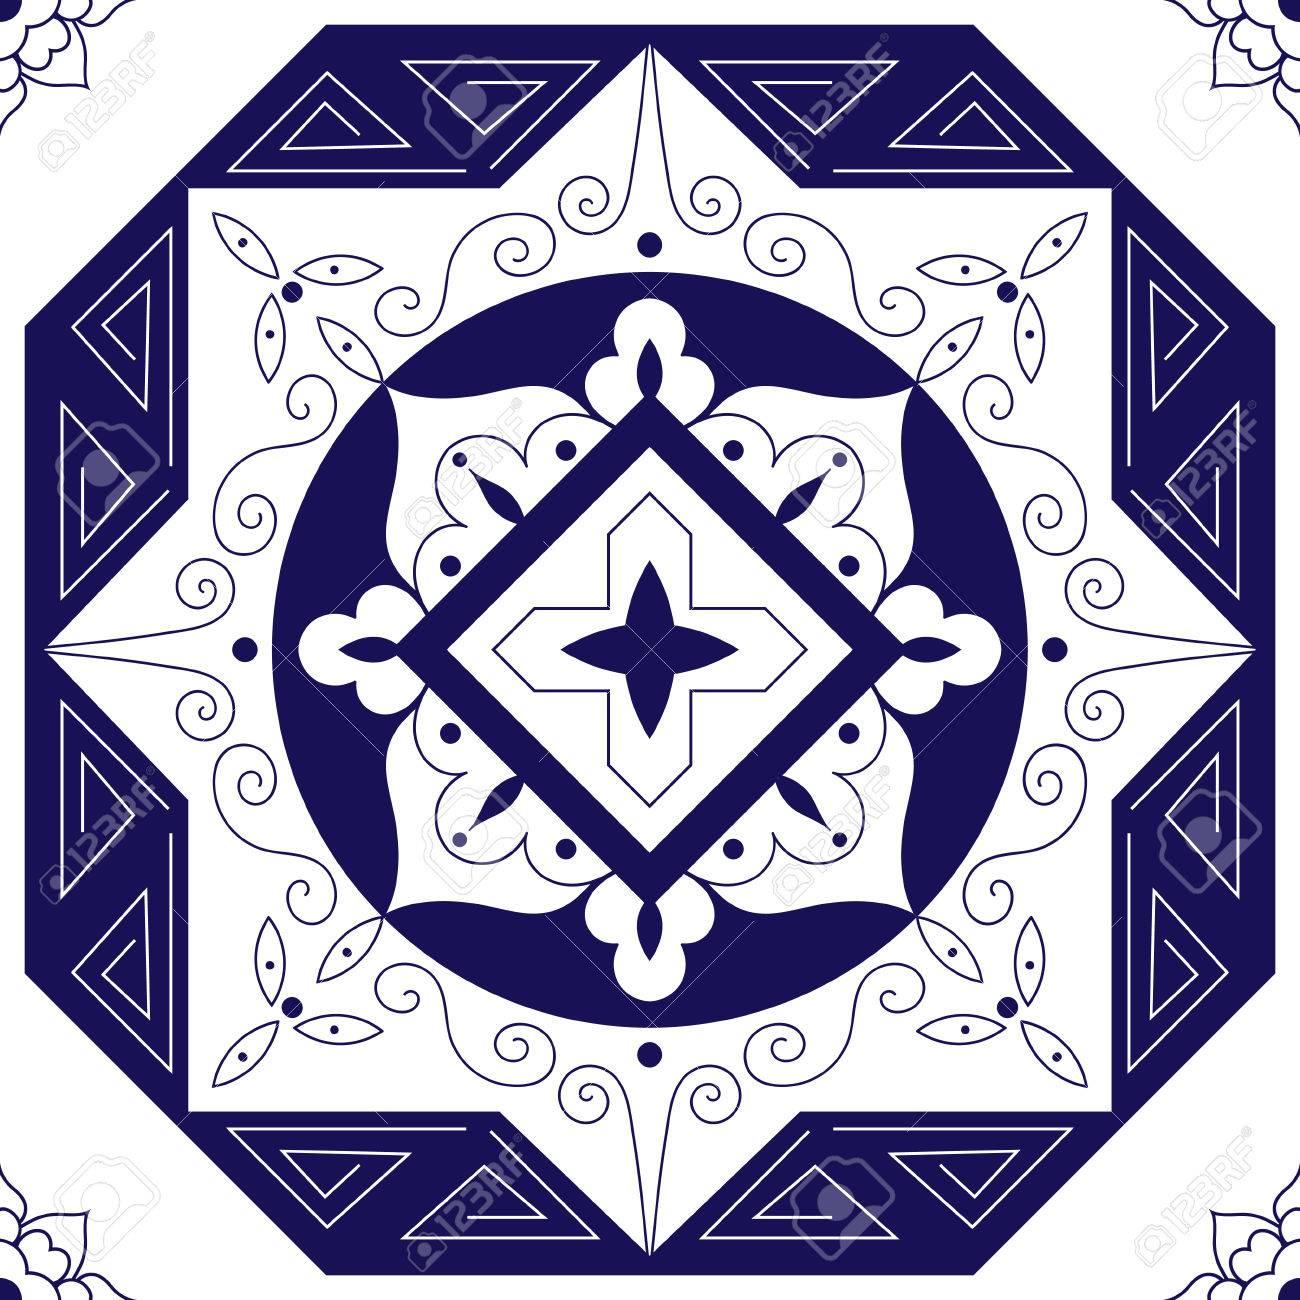 Portugiesische Fliesen Azulejos Muster Vektor Nahtlos Blaues Weißes - Portugiesische fliesen azulejos